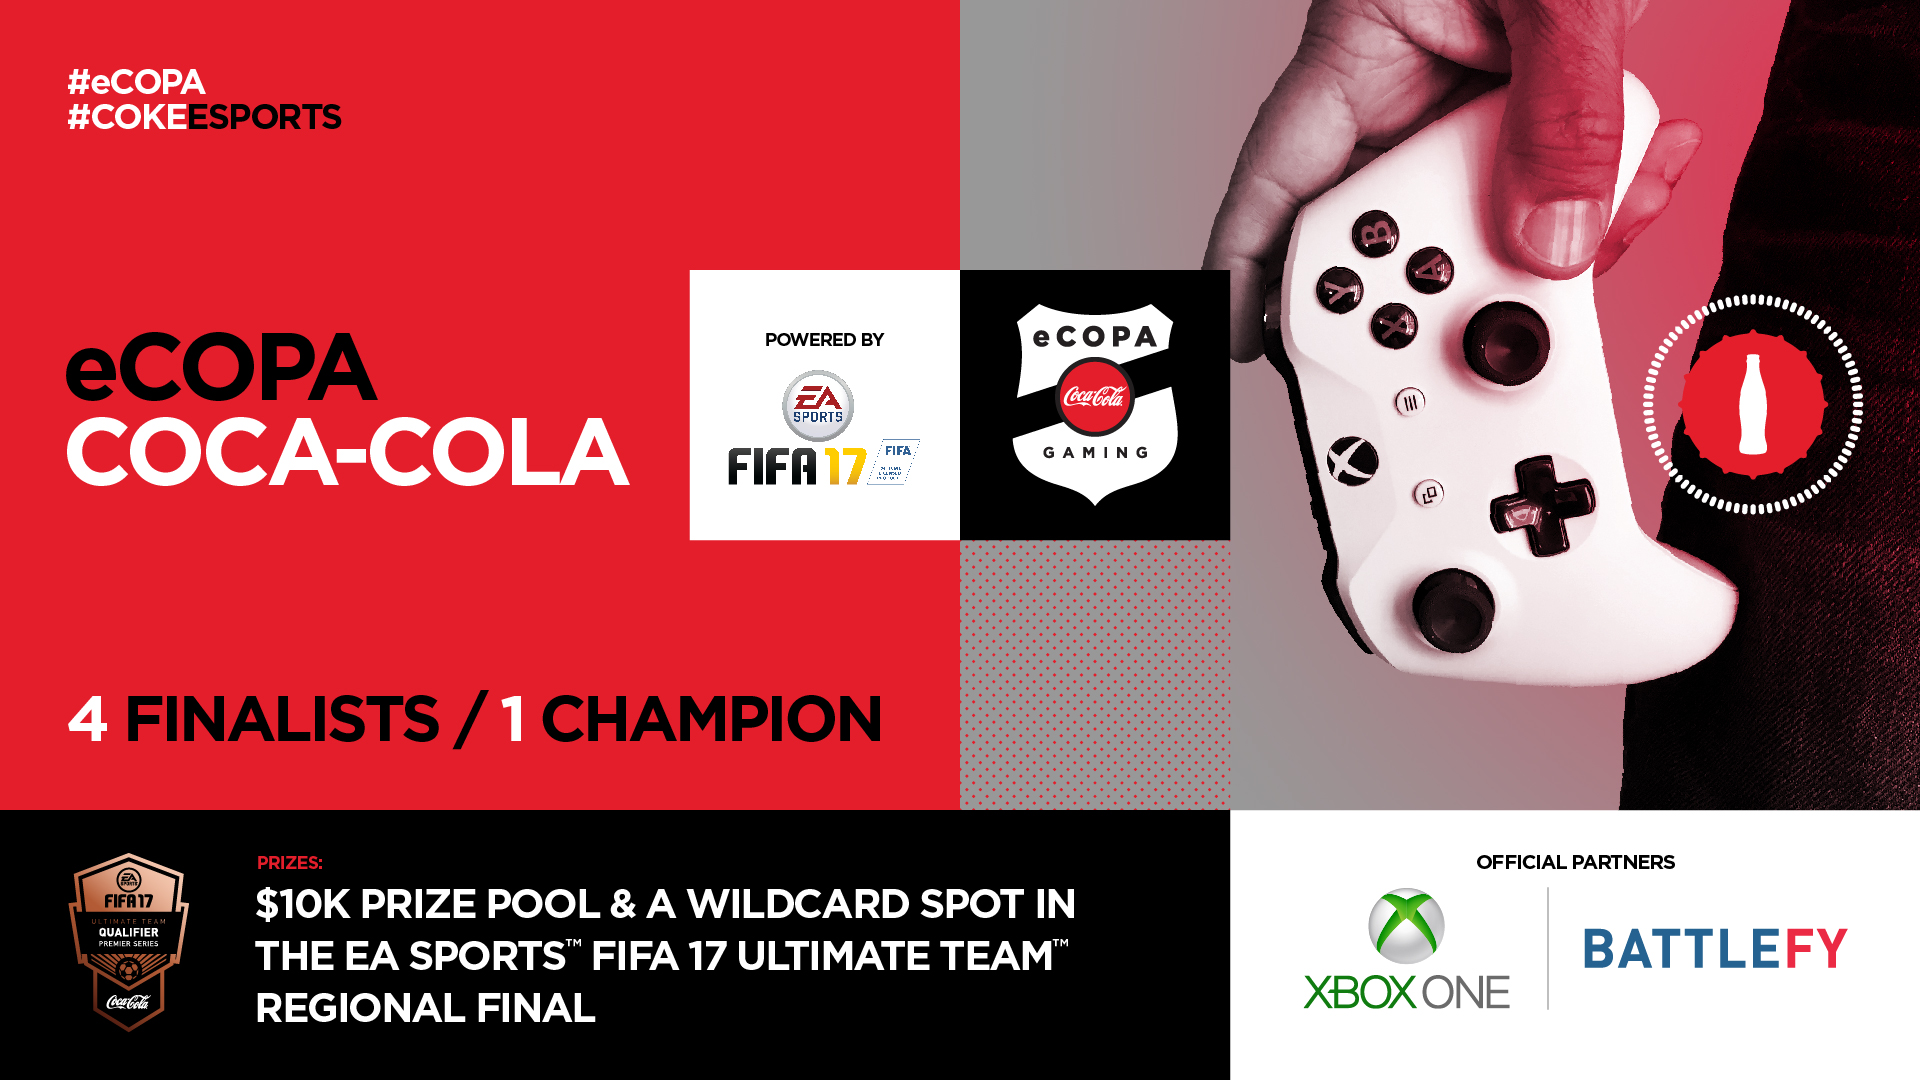 TNL eSports Brand Tracker 044: Coca-Cola (Photo: Battlefy)